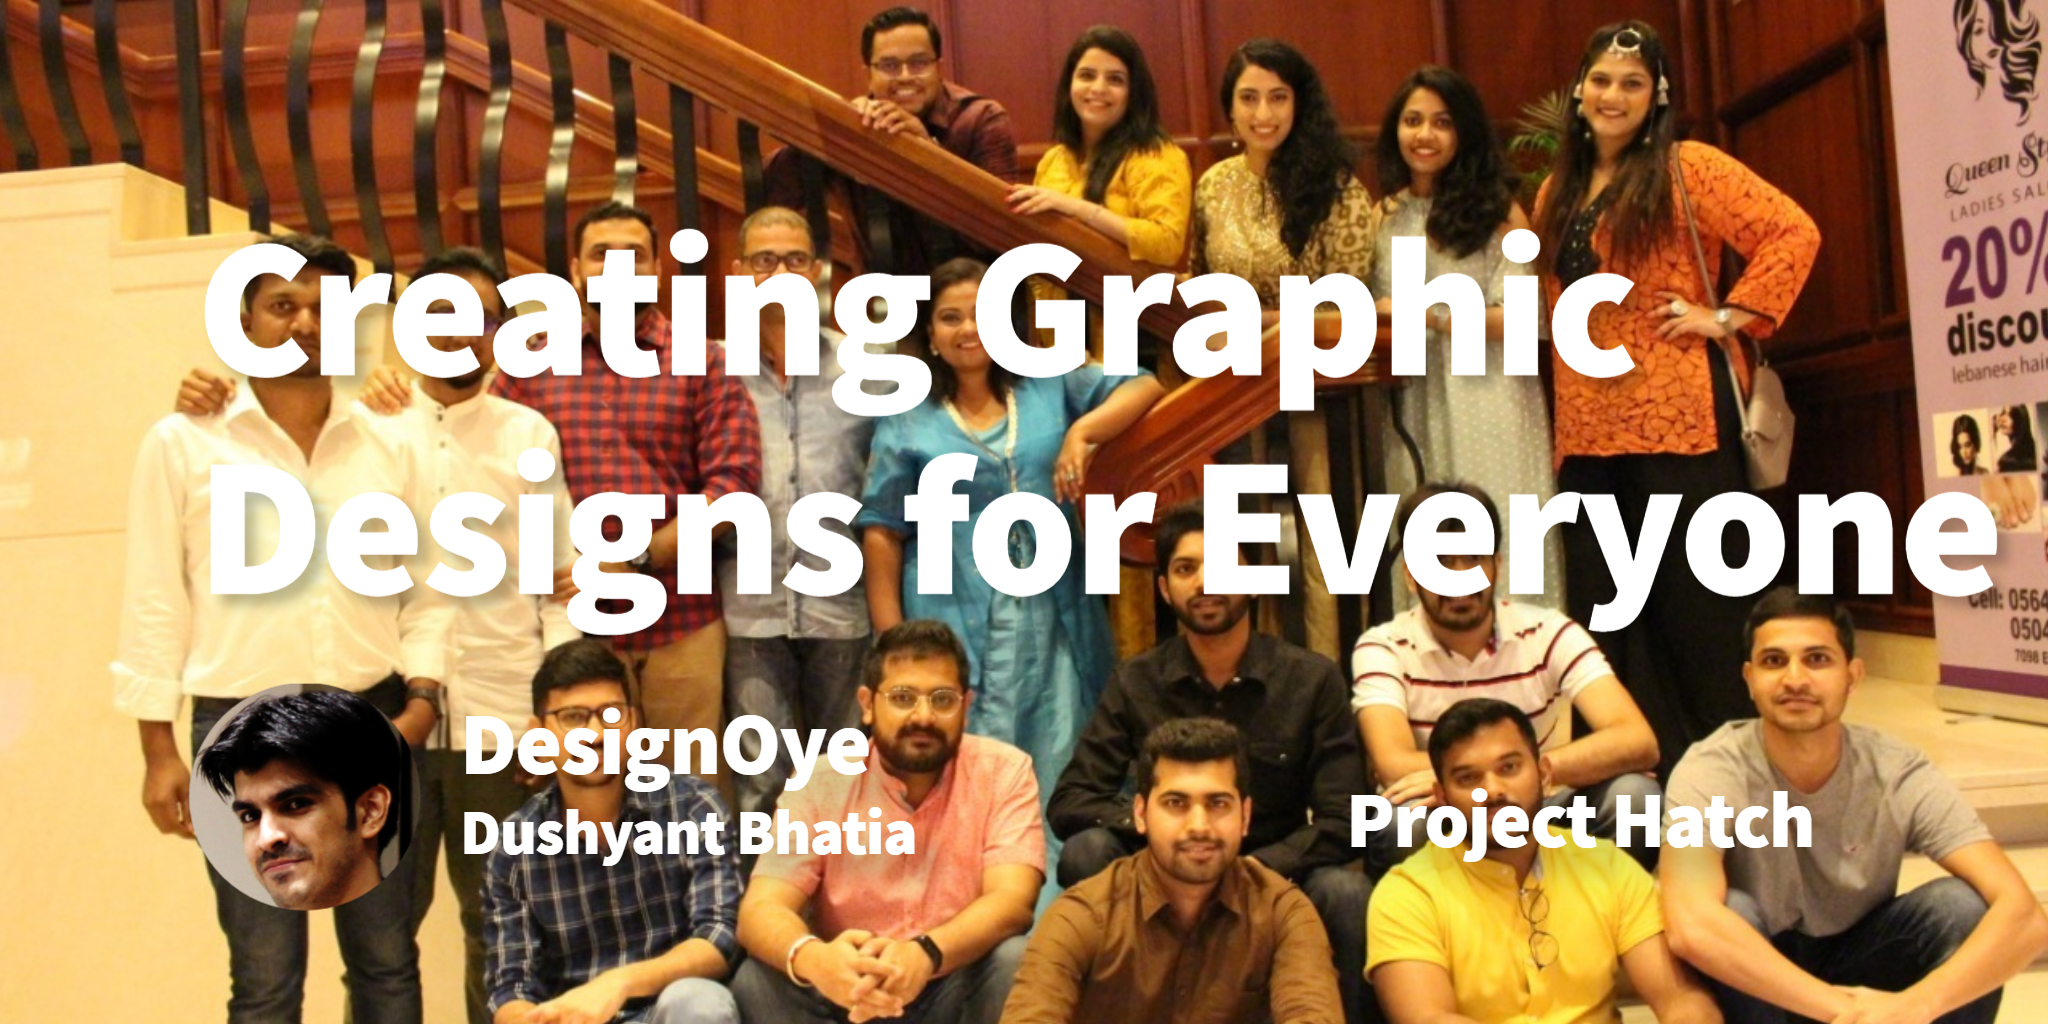 DesignOye Dushyant Bhatia